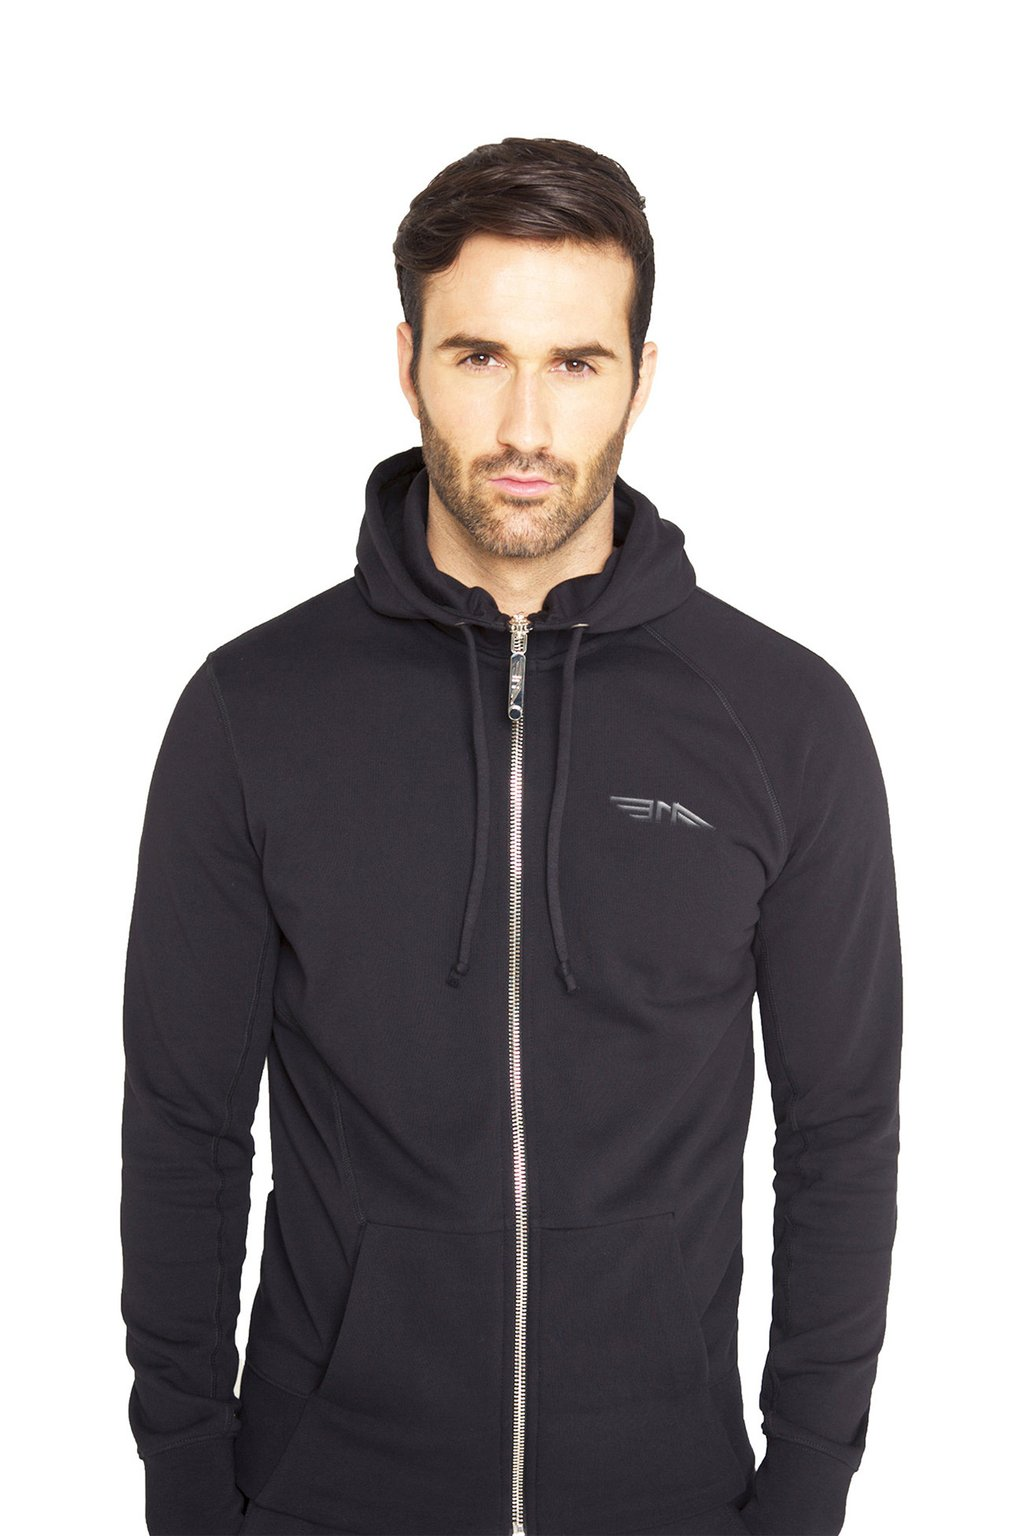 BAA-Clothing-Mens-Hoodied-Zip-Through-Sweatshirt-Front_1024x.jpg